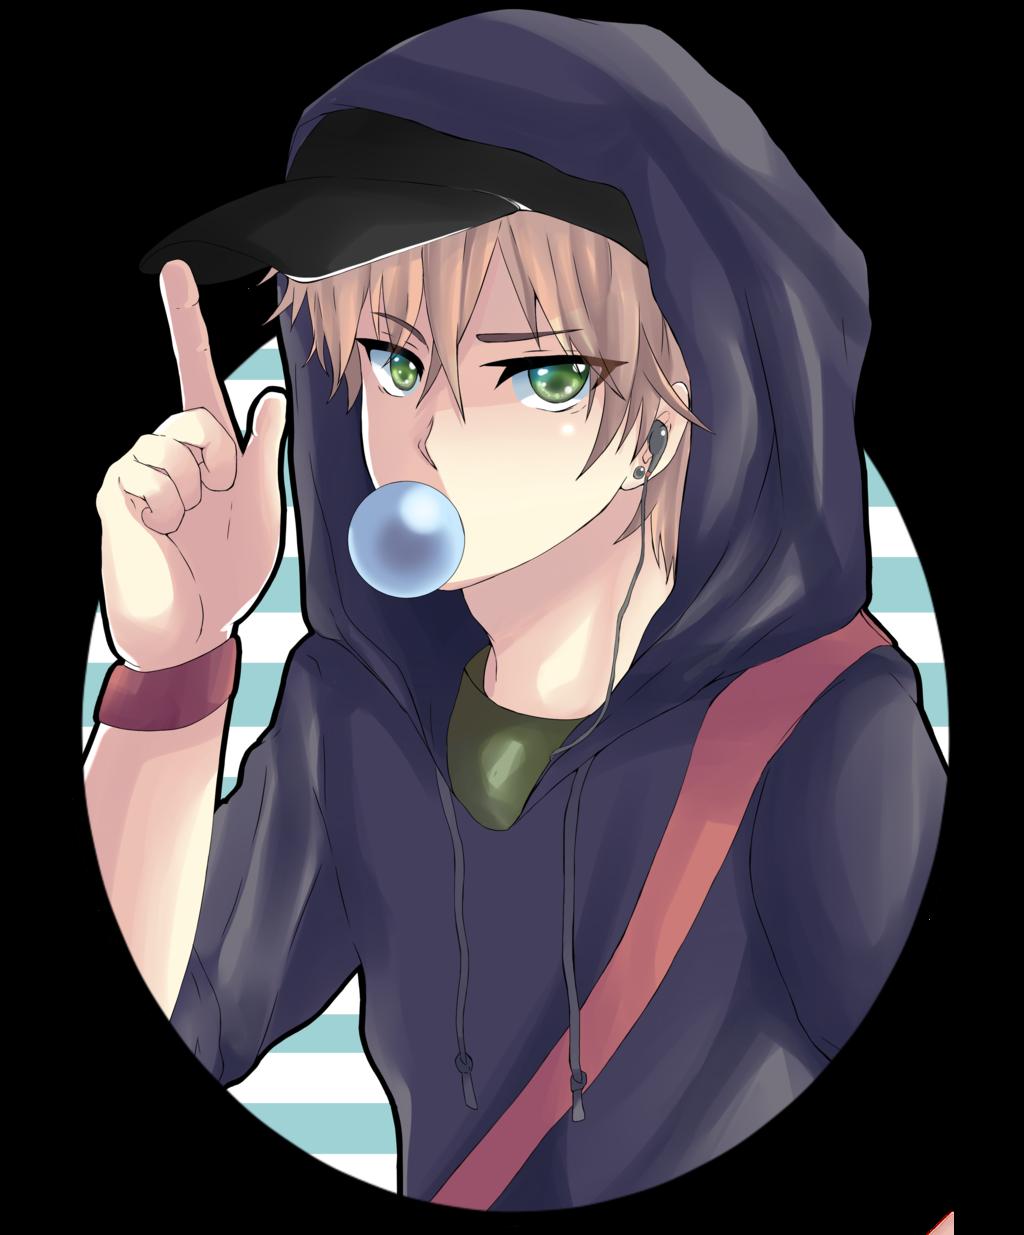 Anime boy transparent image png image